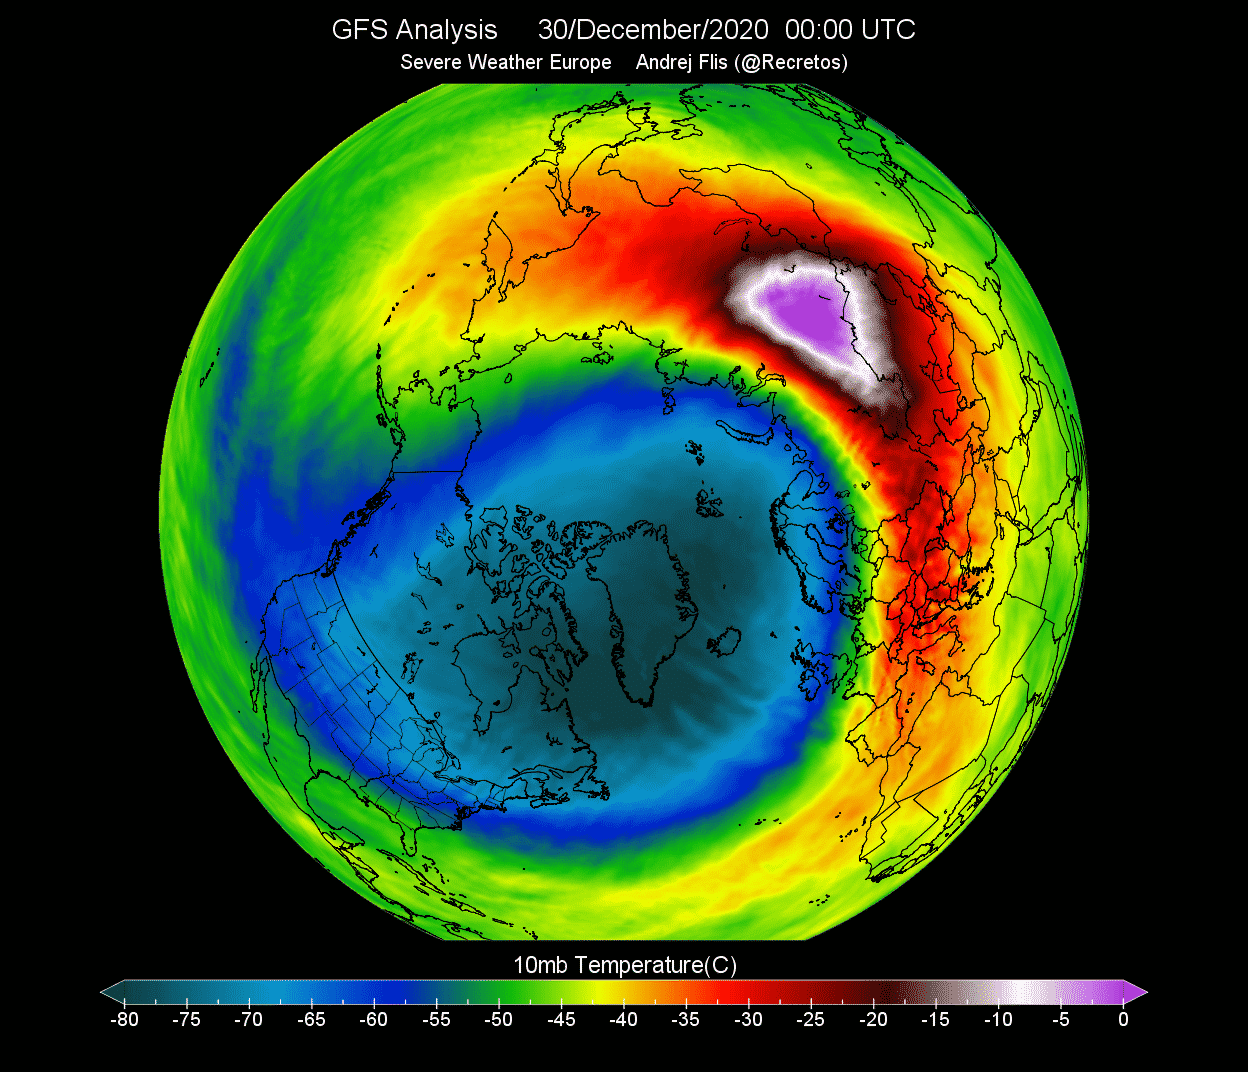 polar-vortex-weather-winter-2021-united-states-europe-peak-temperature-stratospheric-warming